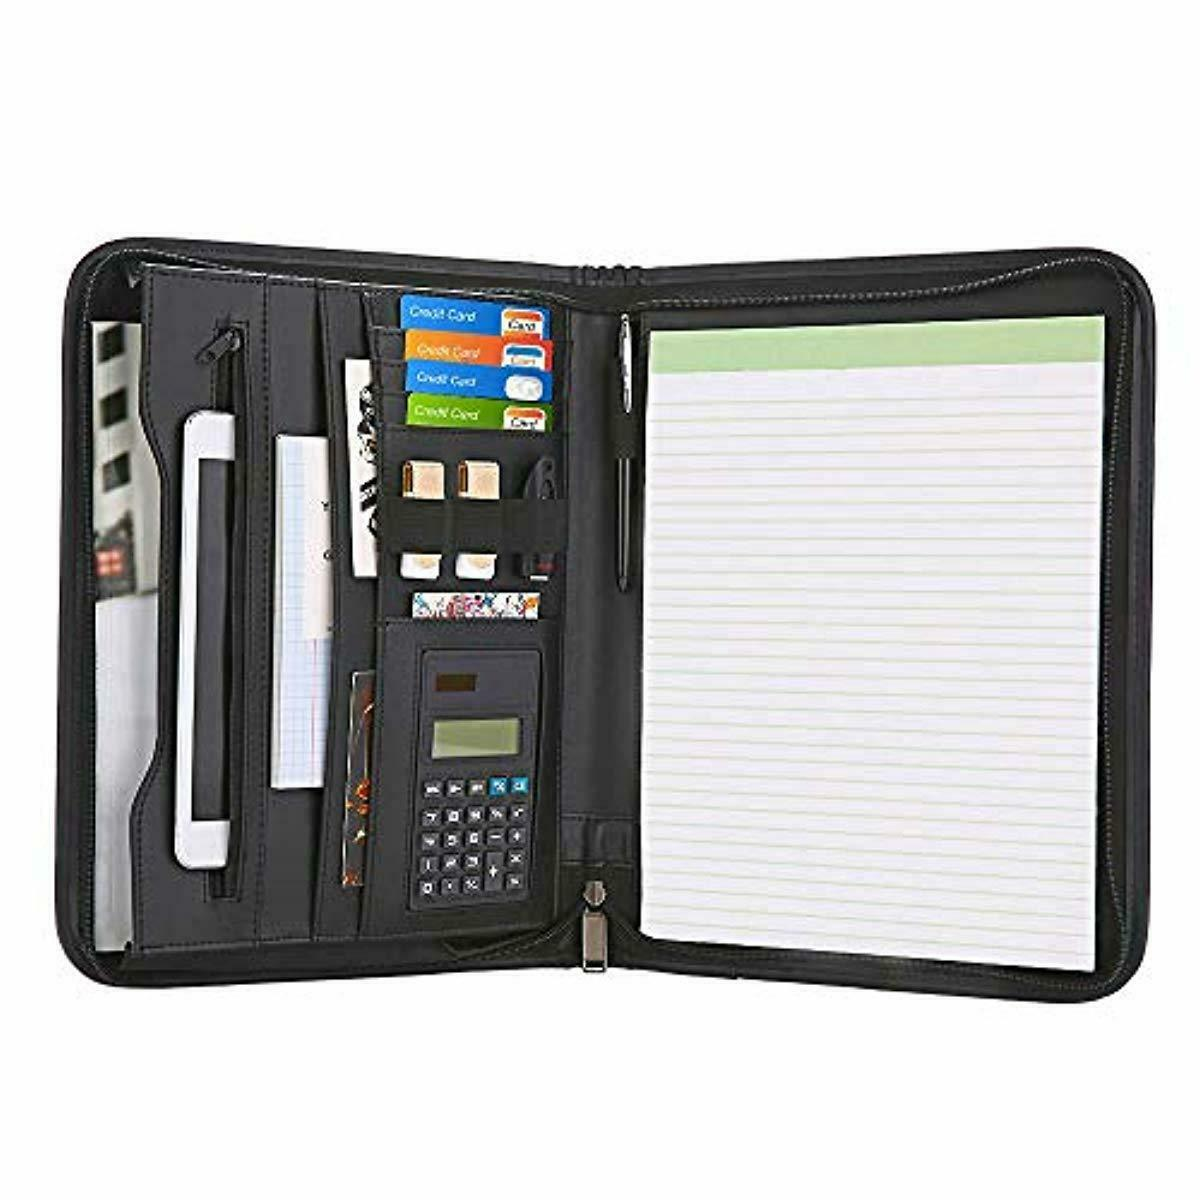 Zippered Padfolio with Calculator Black PU Leather Portfolio